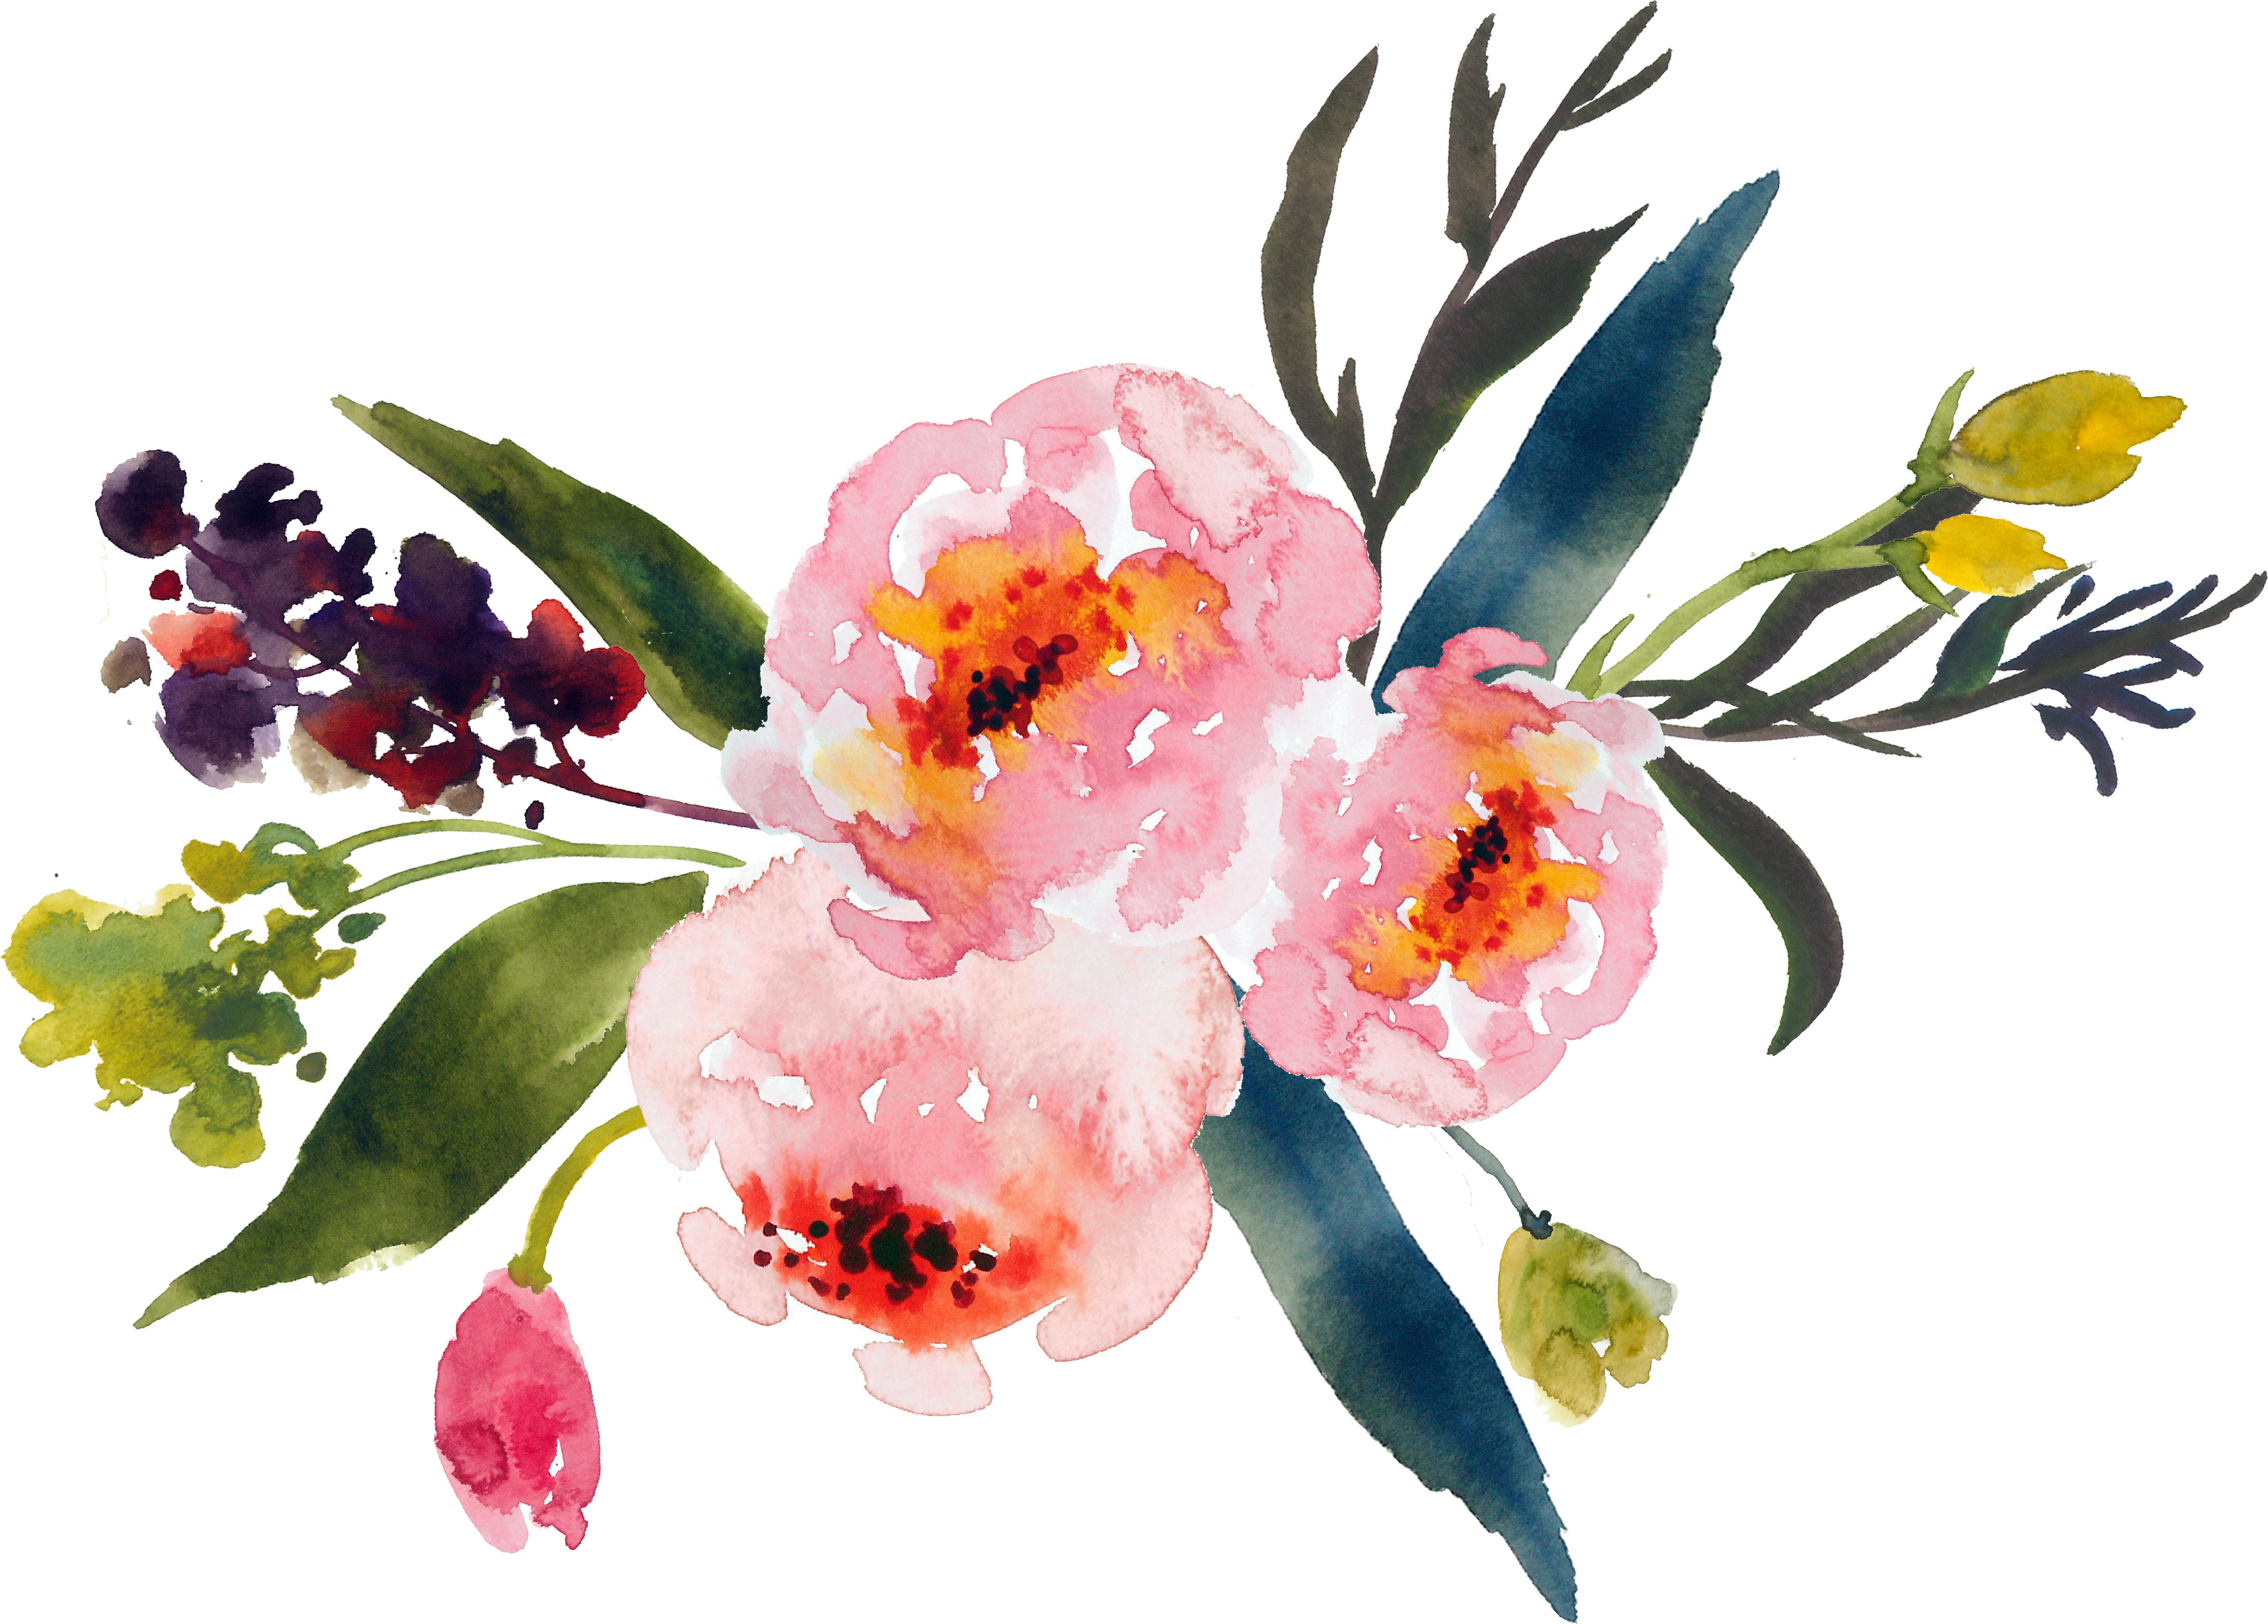 Watercolor flower clipart png picture transparent stock Flower bouquet Watercolor painting Clip art - watercolor flower 4842 ... picture transparent stock